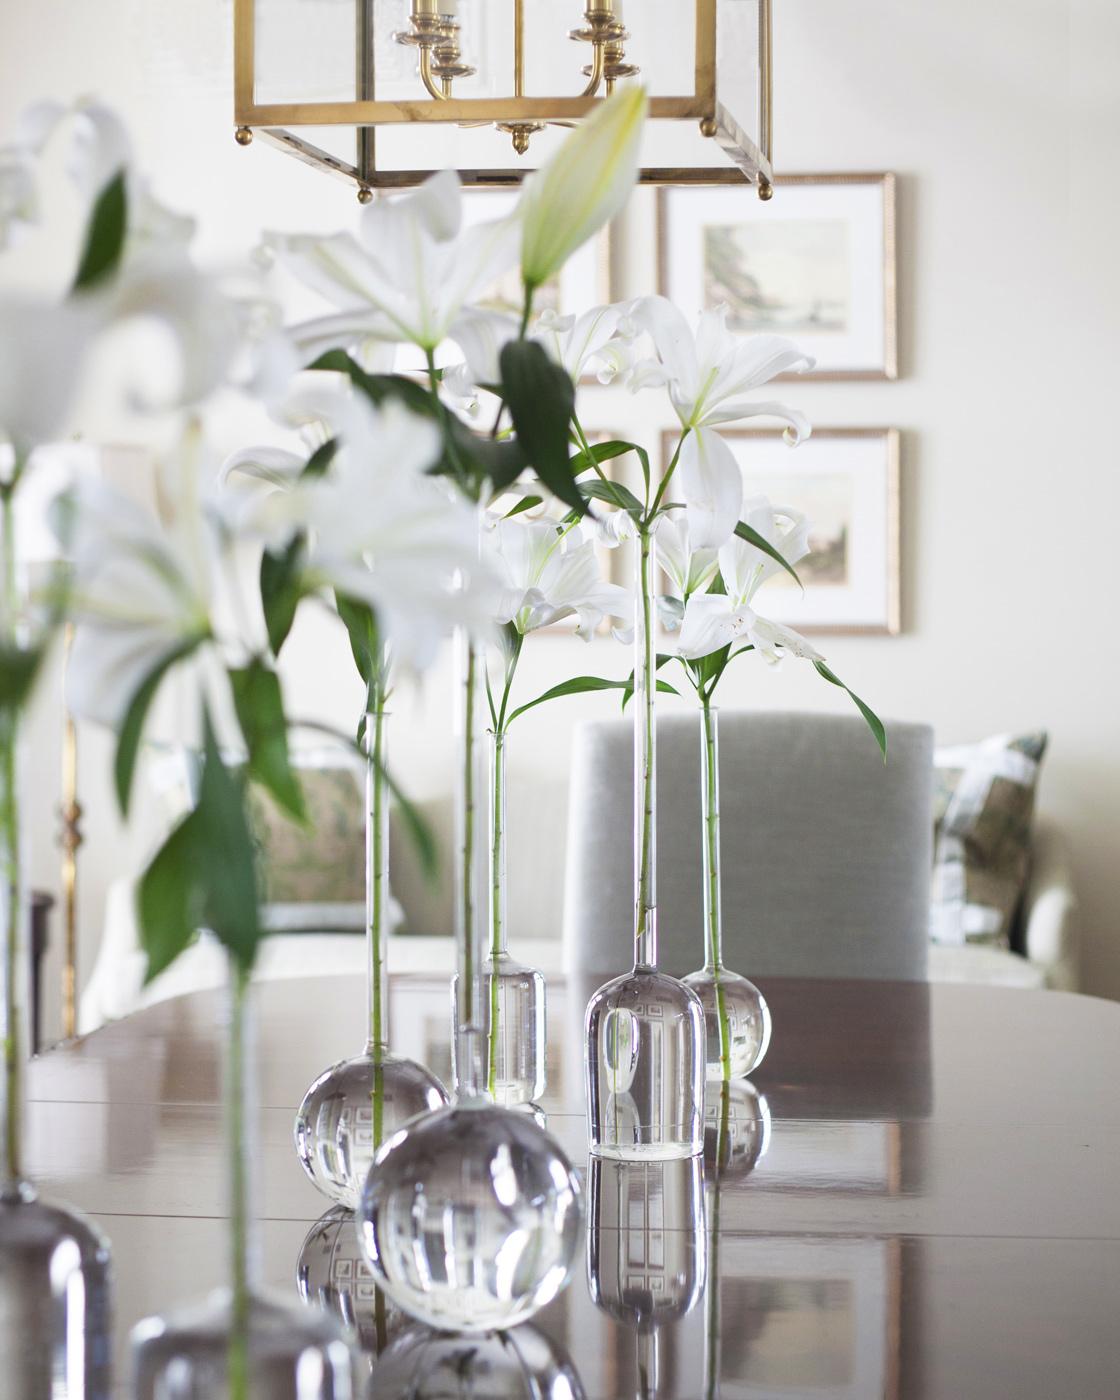 Cindy-McCord-Interior-Design-Collierville-House-023.jpg